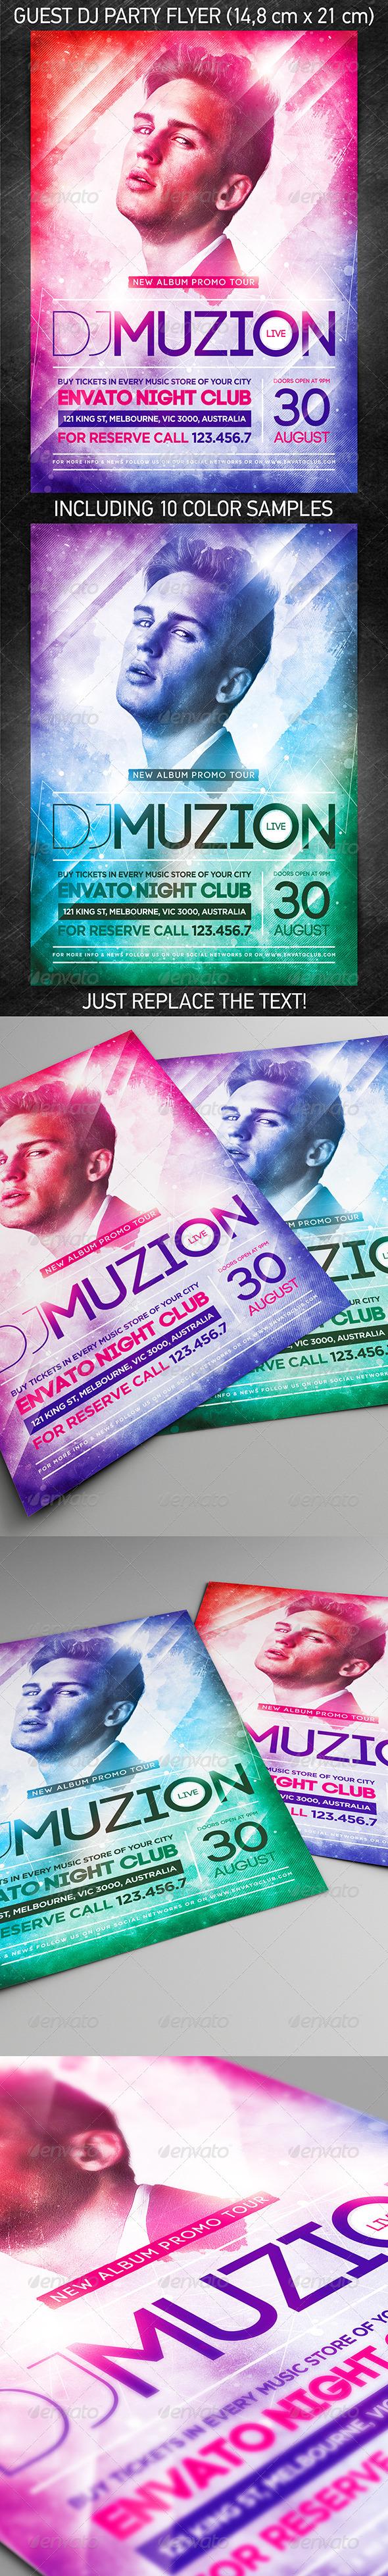 Guest DJ Party Flyer Vol.7 - Clubs & Parties Events